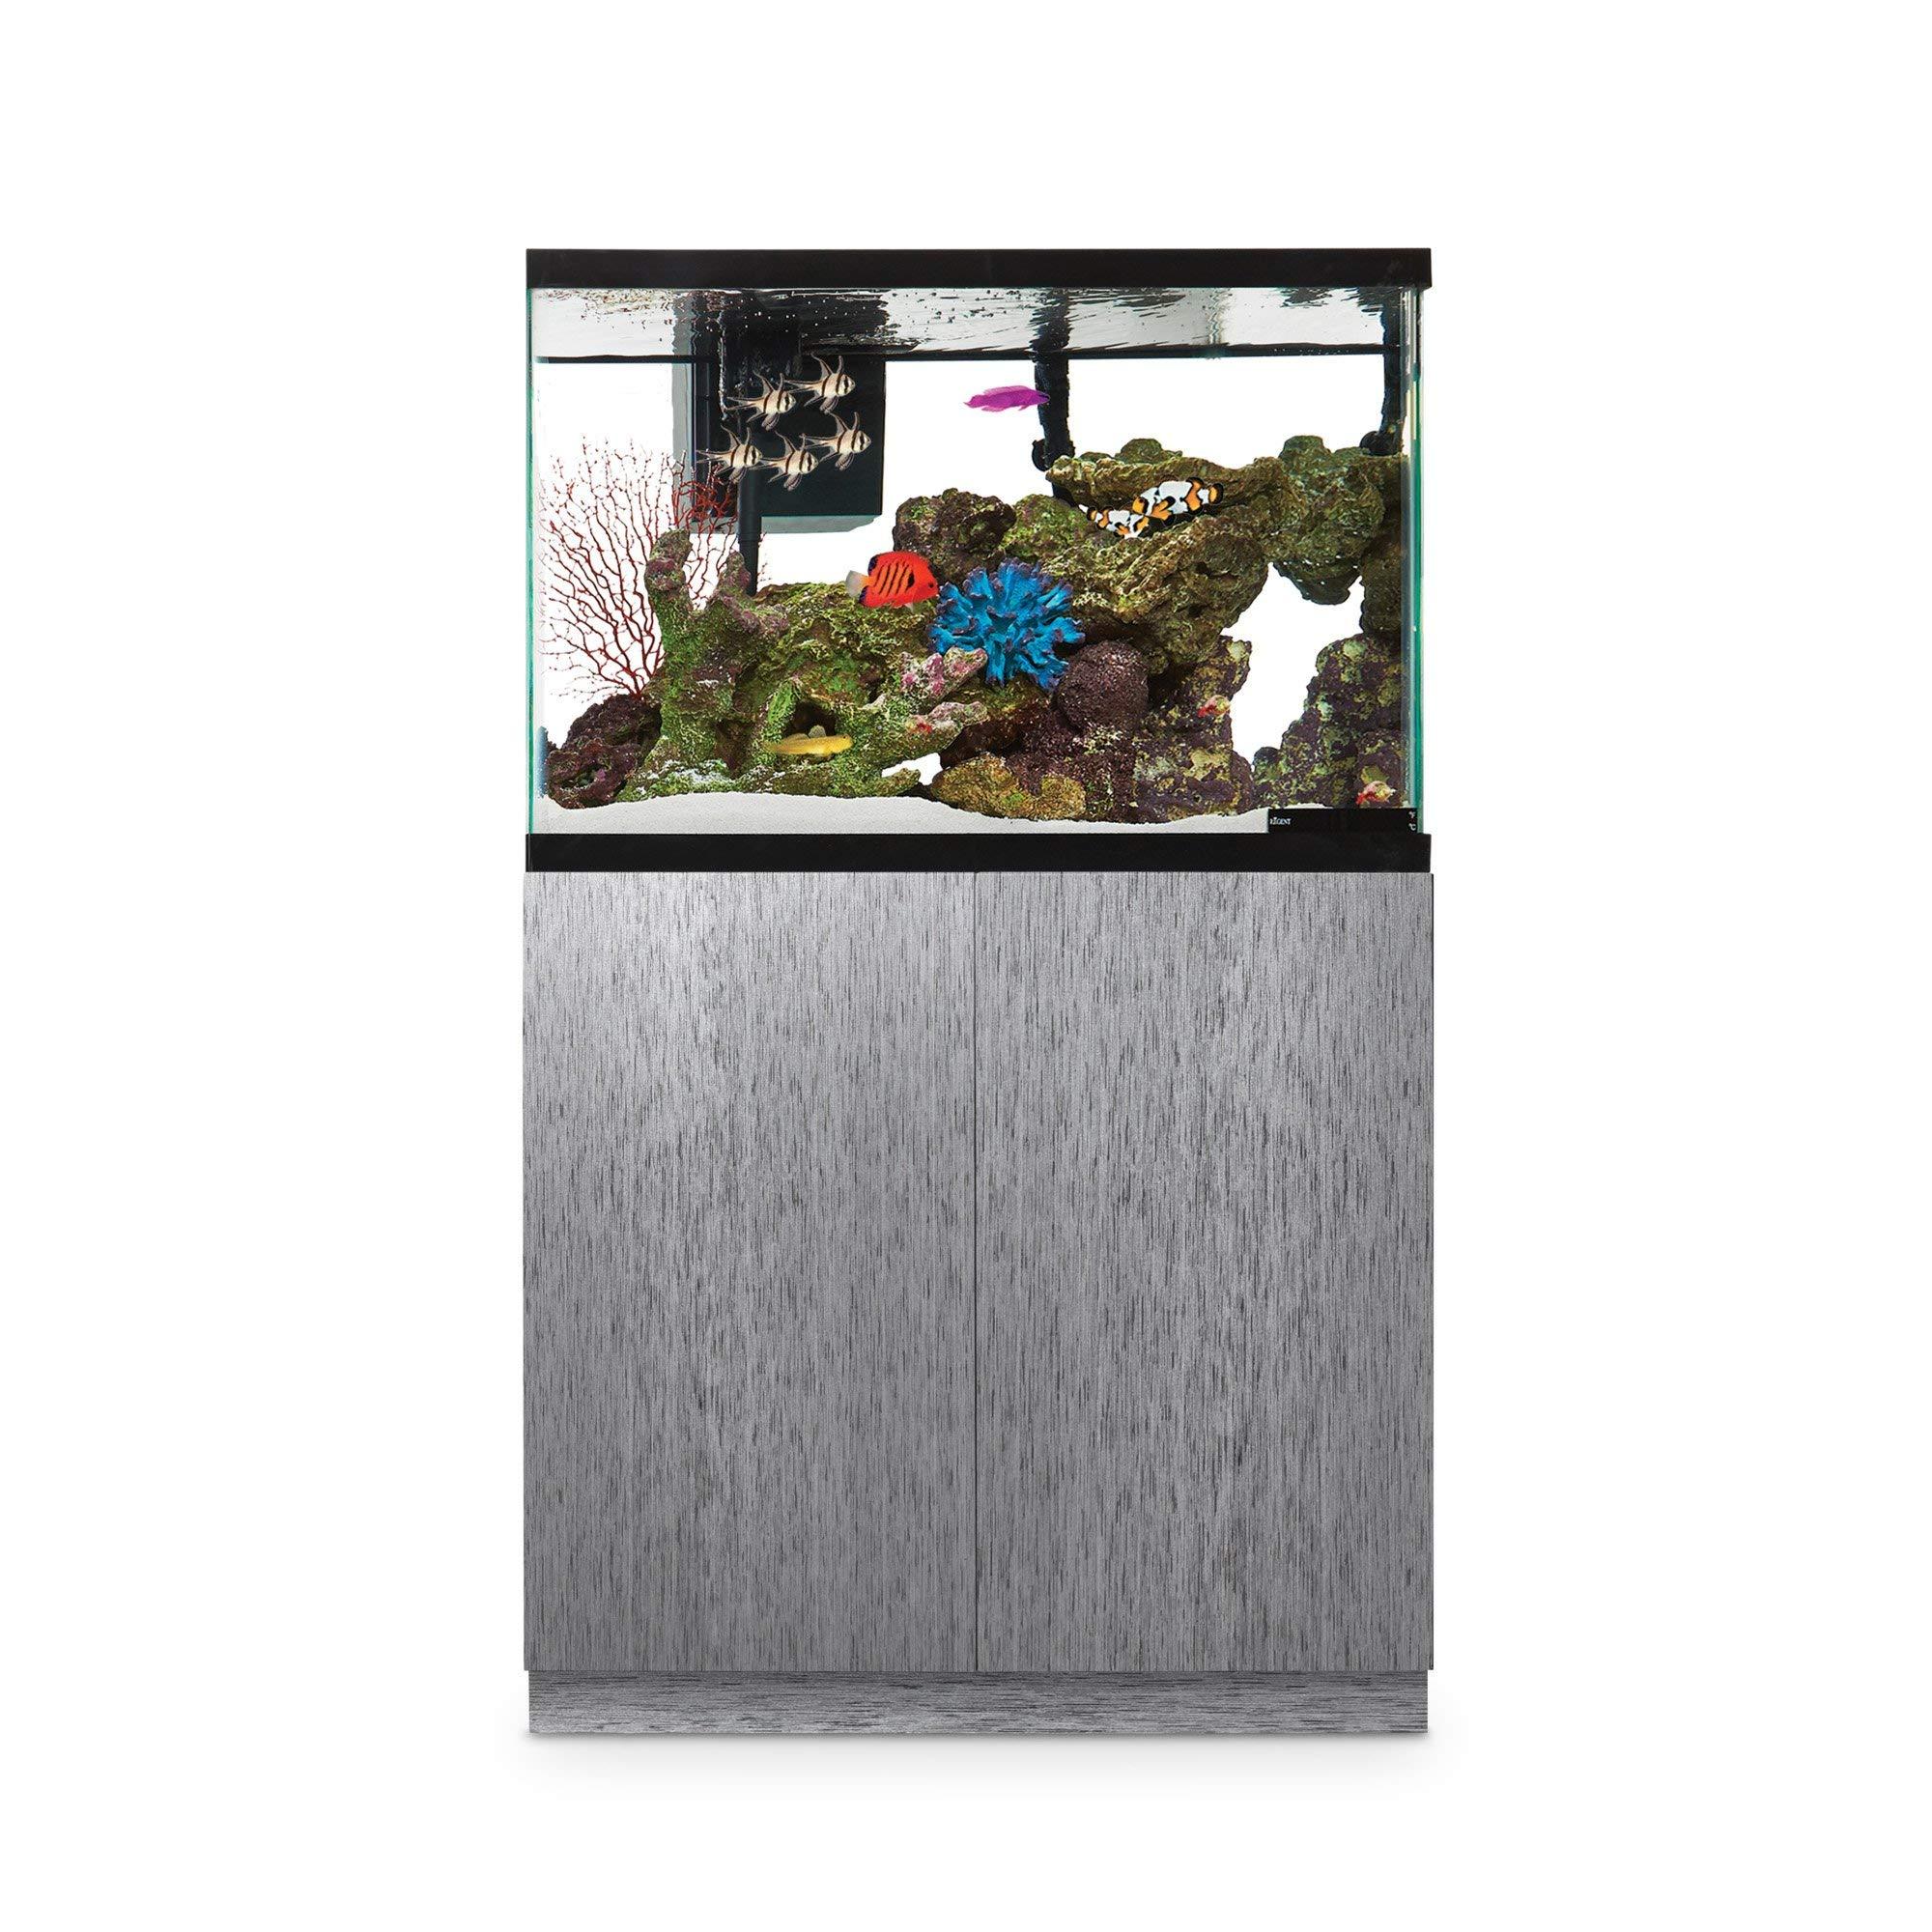 Imagitarium Brushed Steel Look Fish Tank Stand, Up to 40 Gal, 18.25 in by Imagitarium